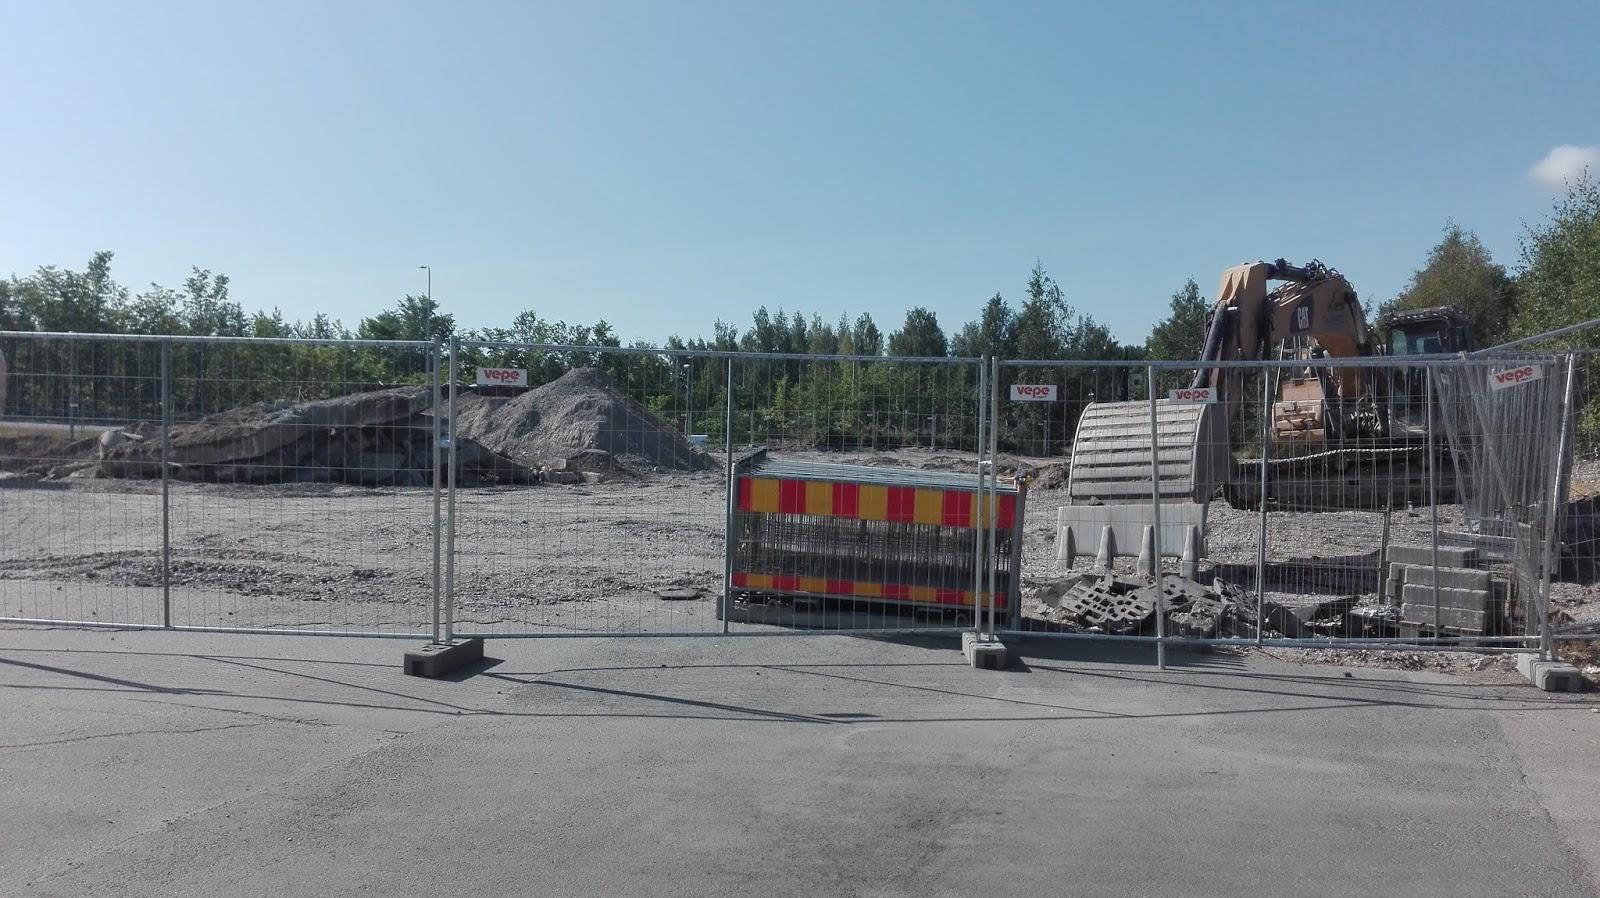 Fresto Pukinmäki